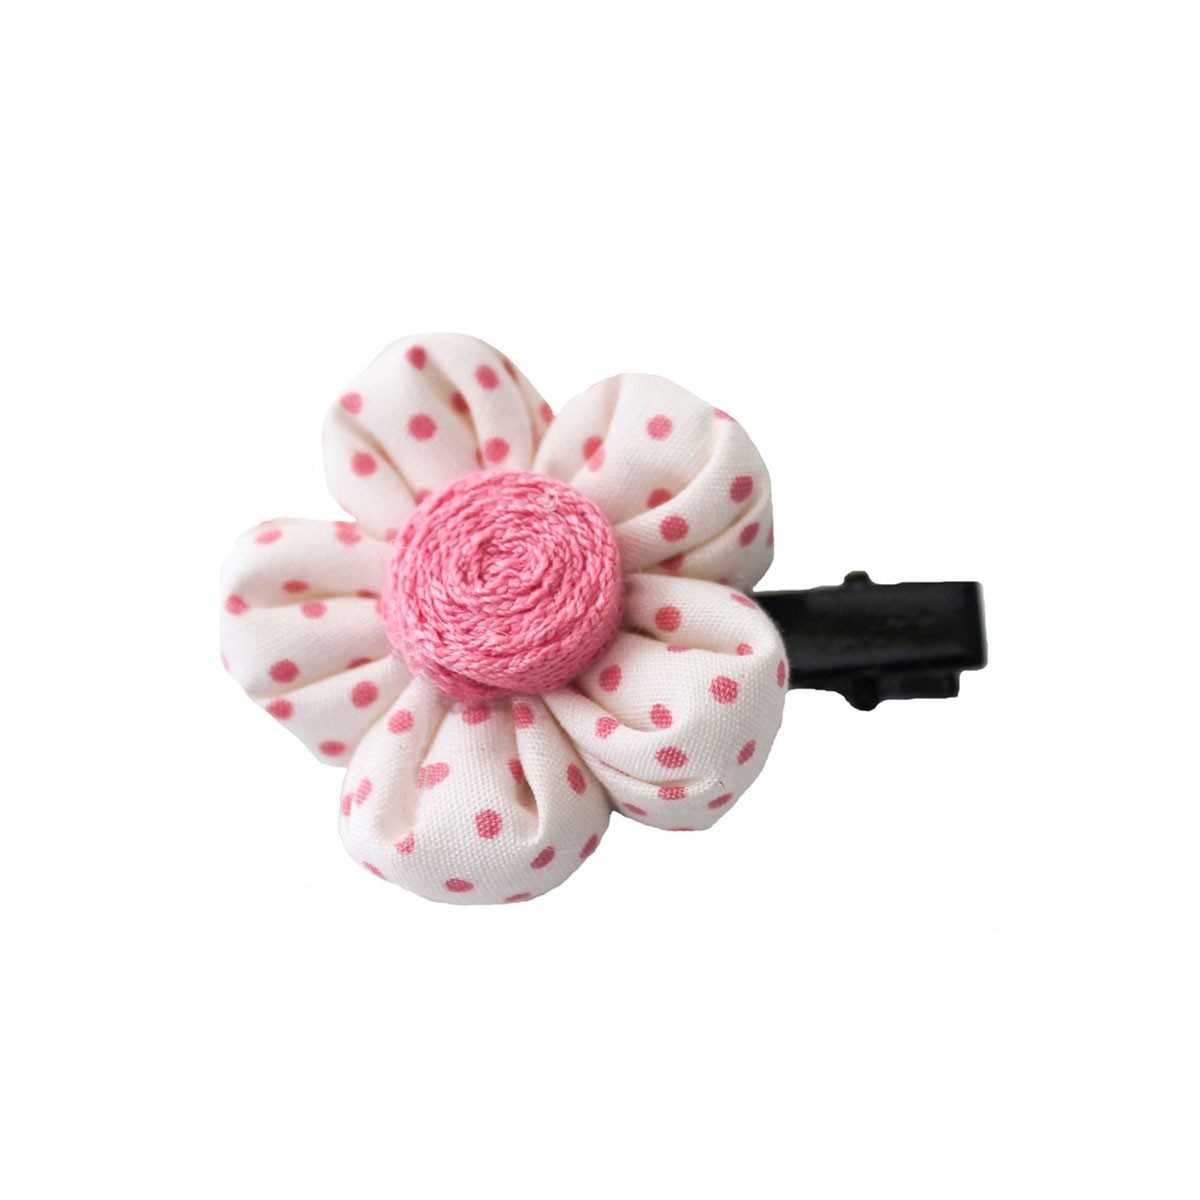 barrette fleur crue pois roses avec pince crocodile. Black Bedroom Furniture Sets. Home Design Ideas